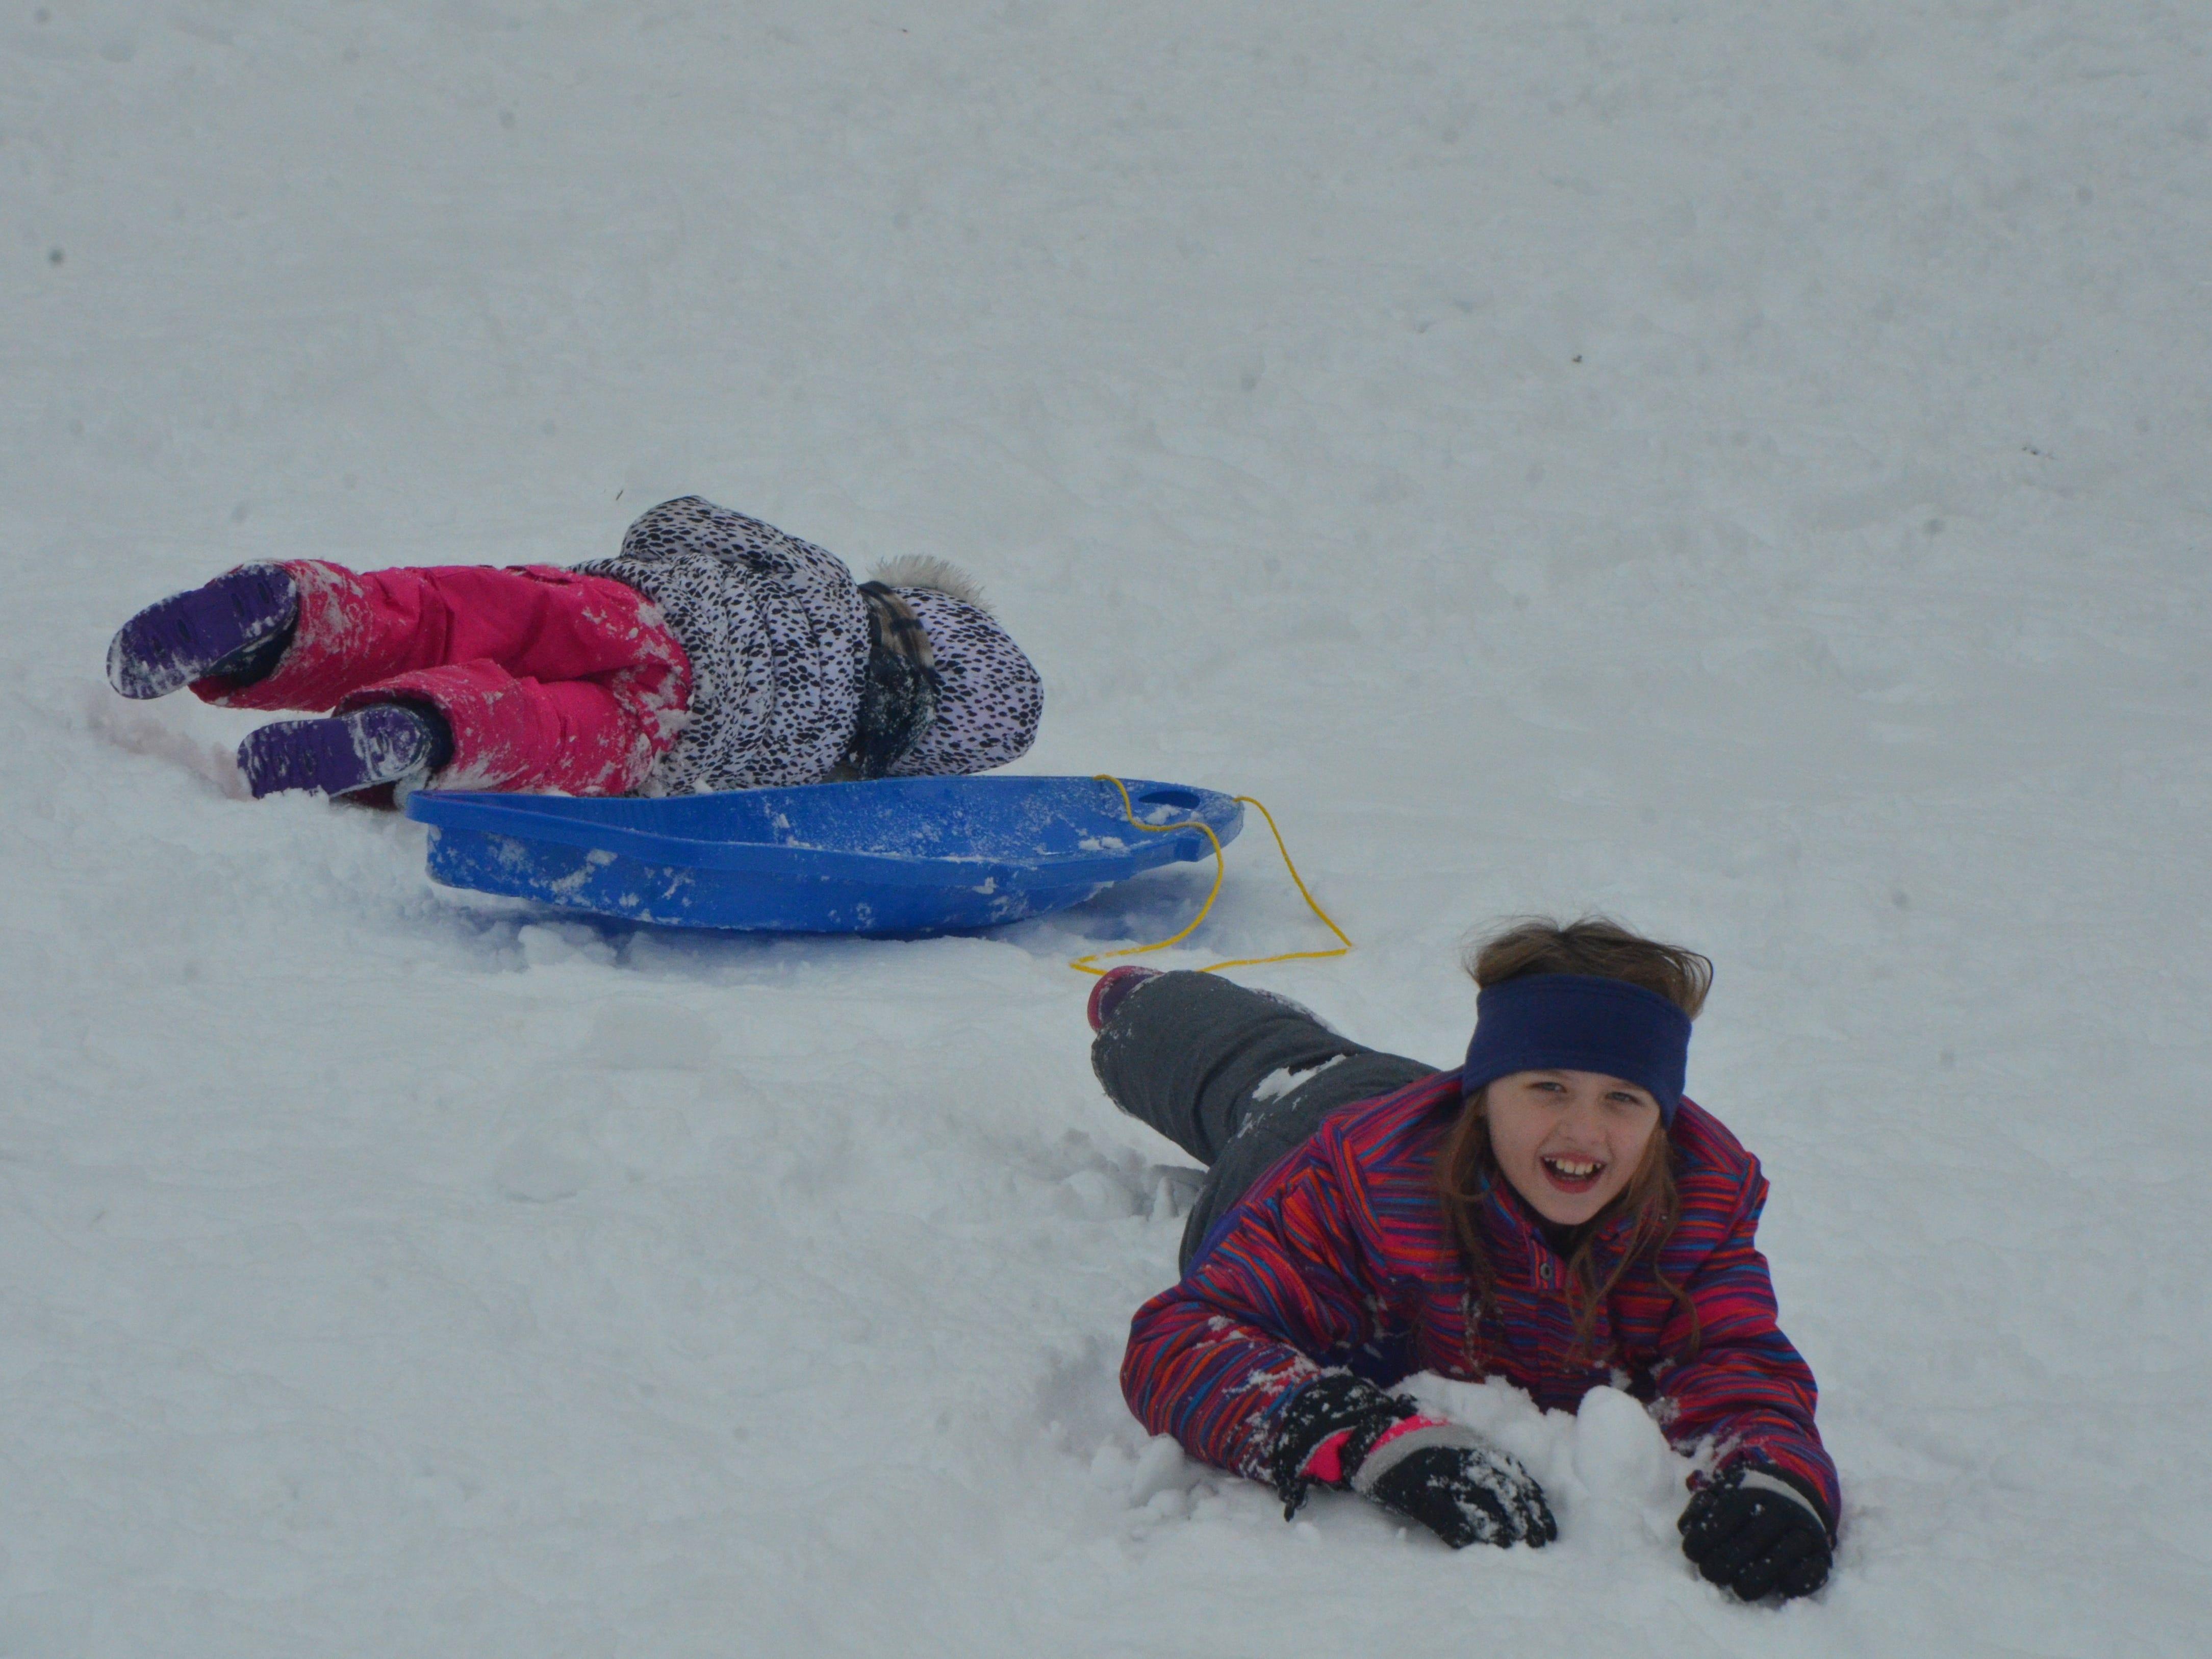 Alexandria Camburn, 11, and Nadia Craft, 4, wipe out while sledding at Leila Arboretum on Monday, November 26, 2018.